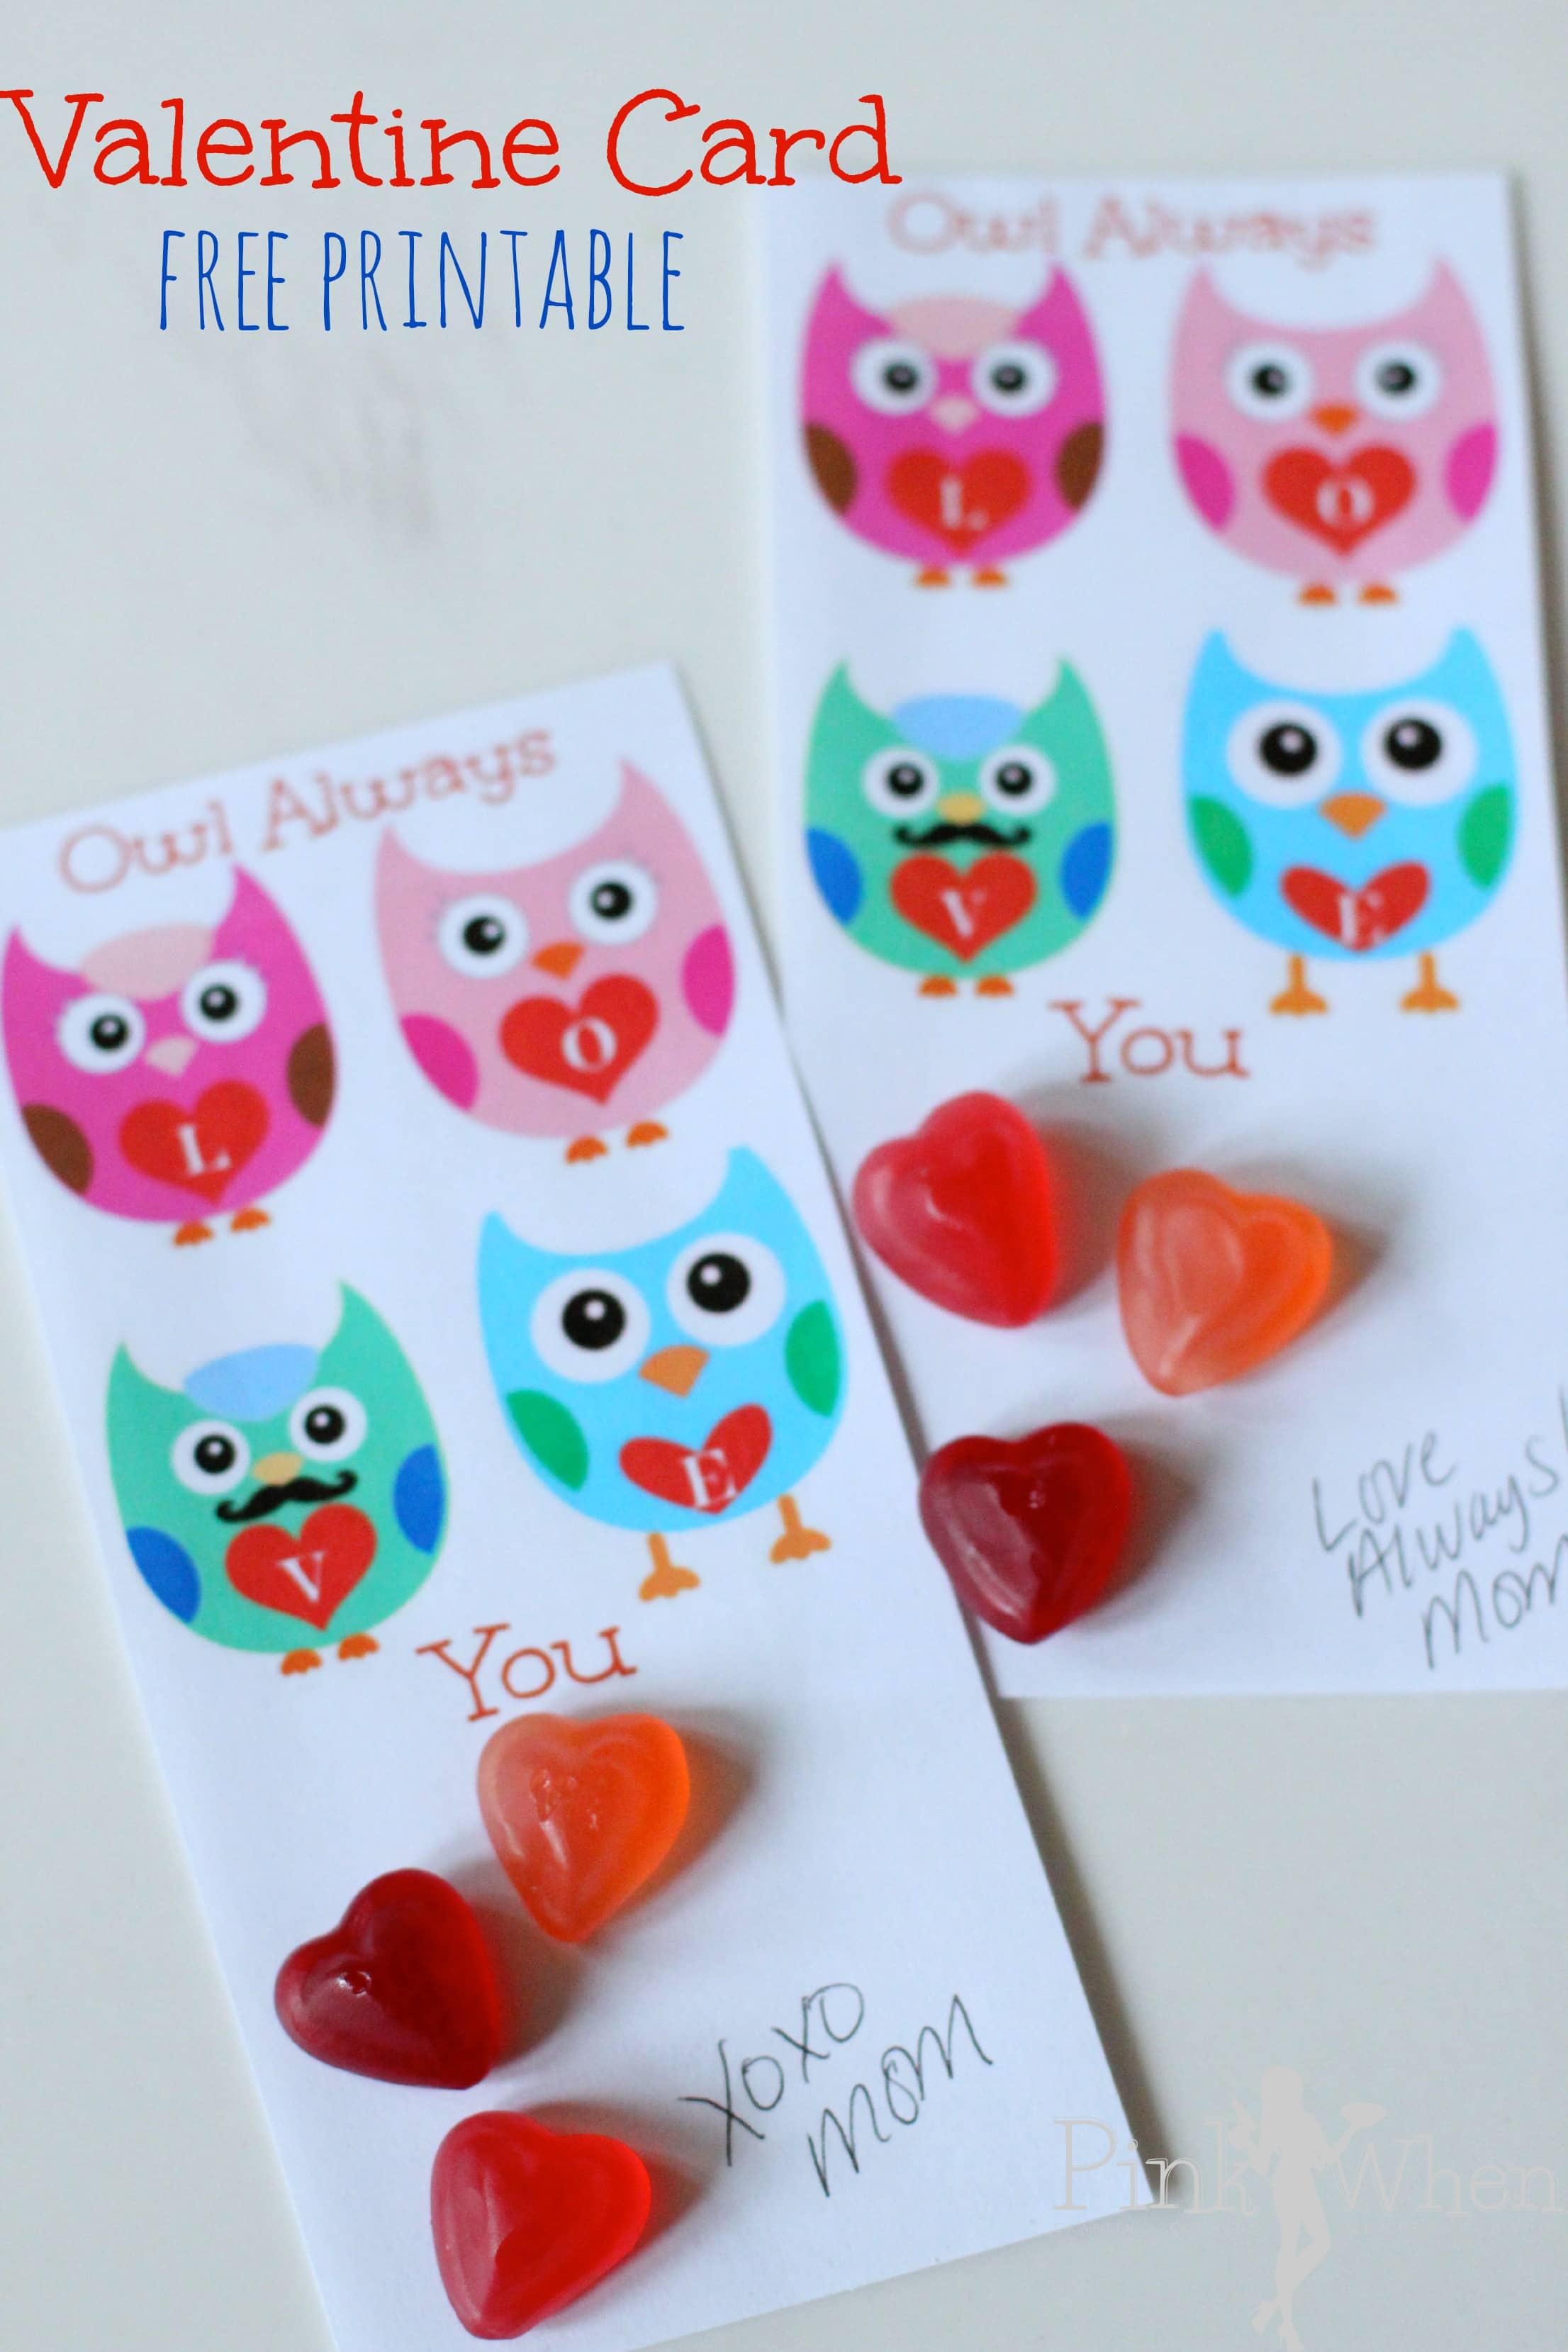 Owl Always Love You Free Printable PinkWhen – Owl Valentine Card